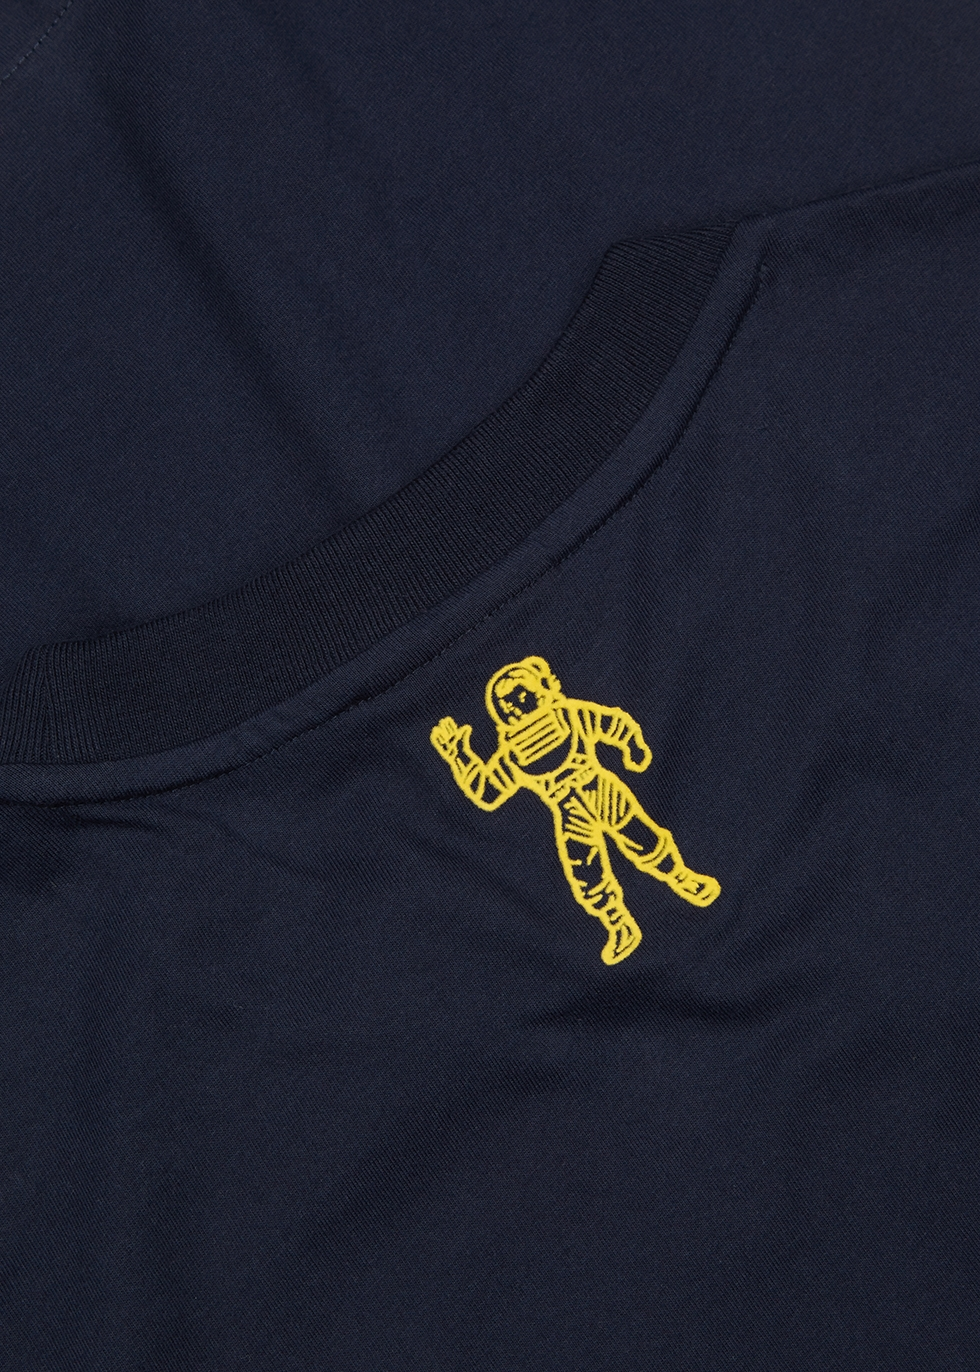 Navy cotton-jersey T-shirt - Billionaire Boys Club